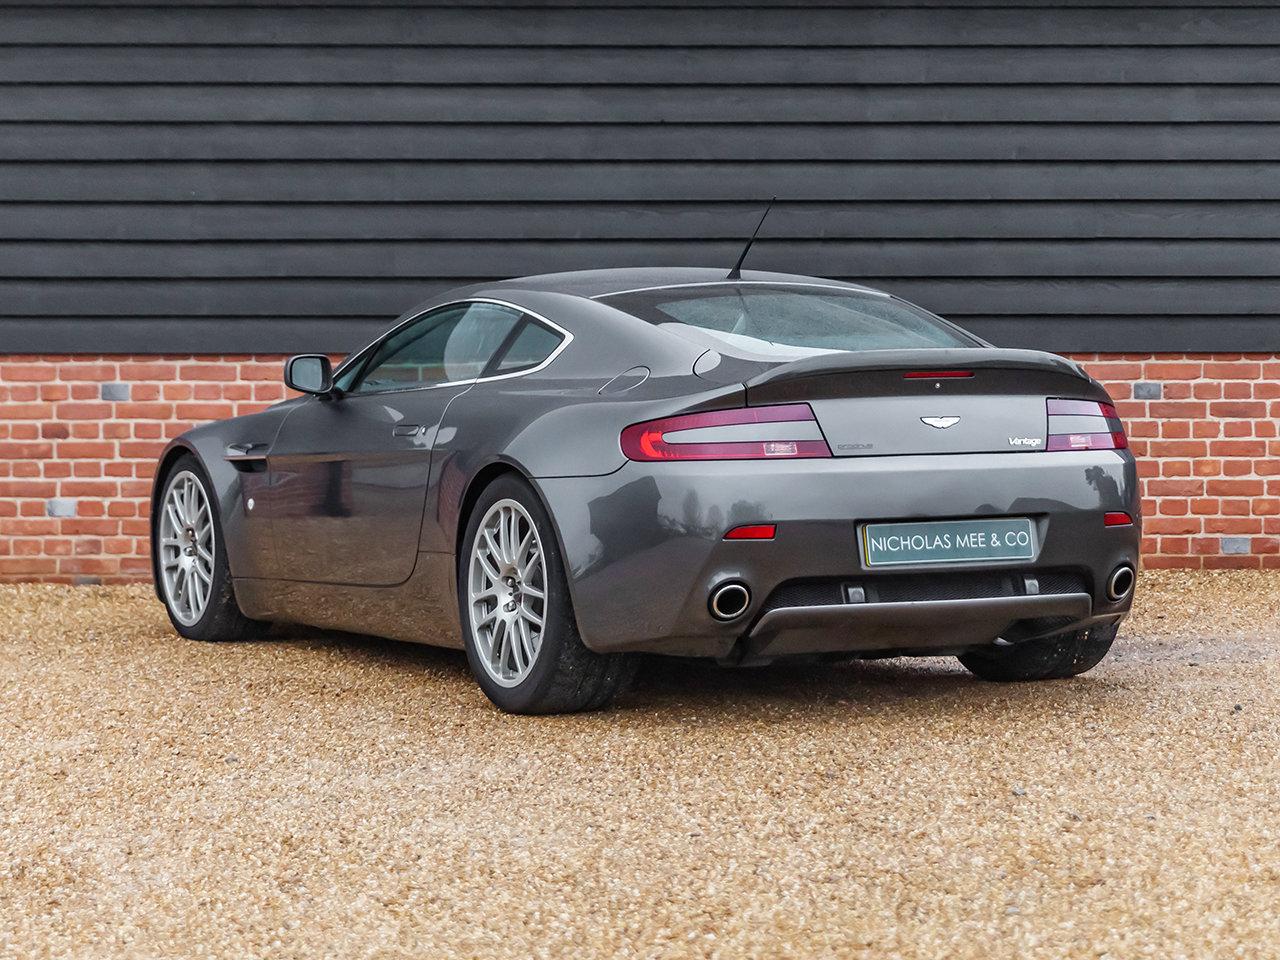 2006 Aston Martin V8 Vantage - Prodrive  For Sale (picture 3 of 6)